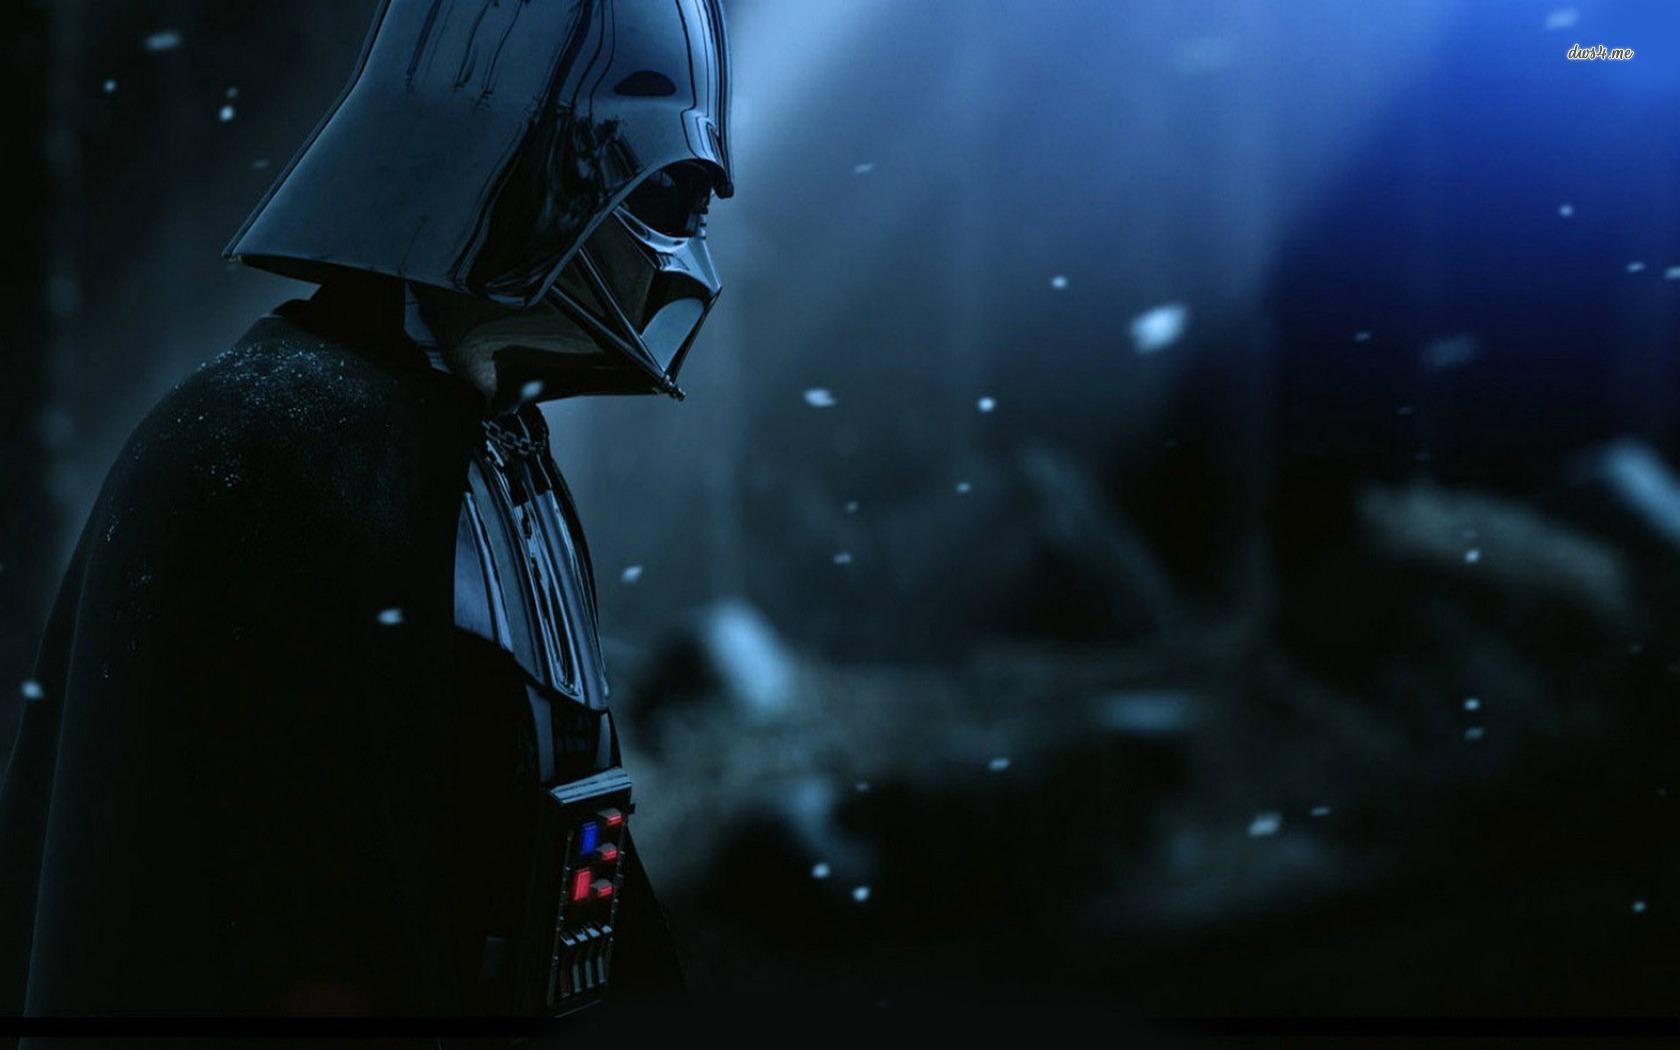 Pics Photos   Darth Vader Wallpaper Image Search Results 1680x1050